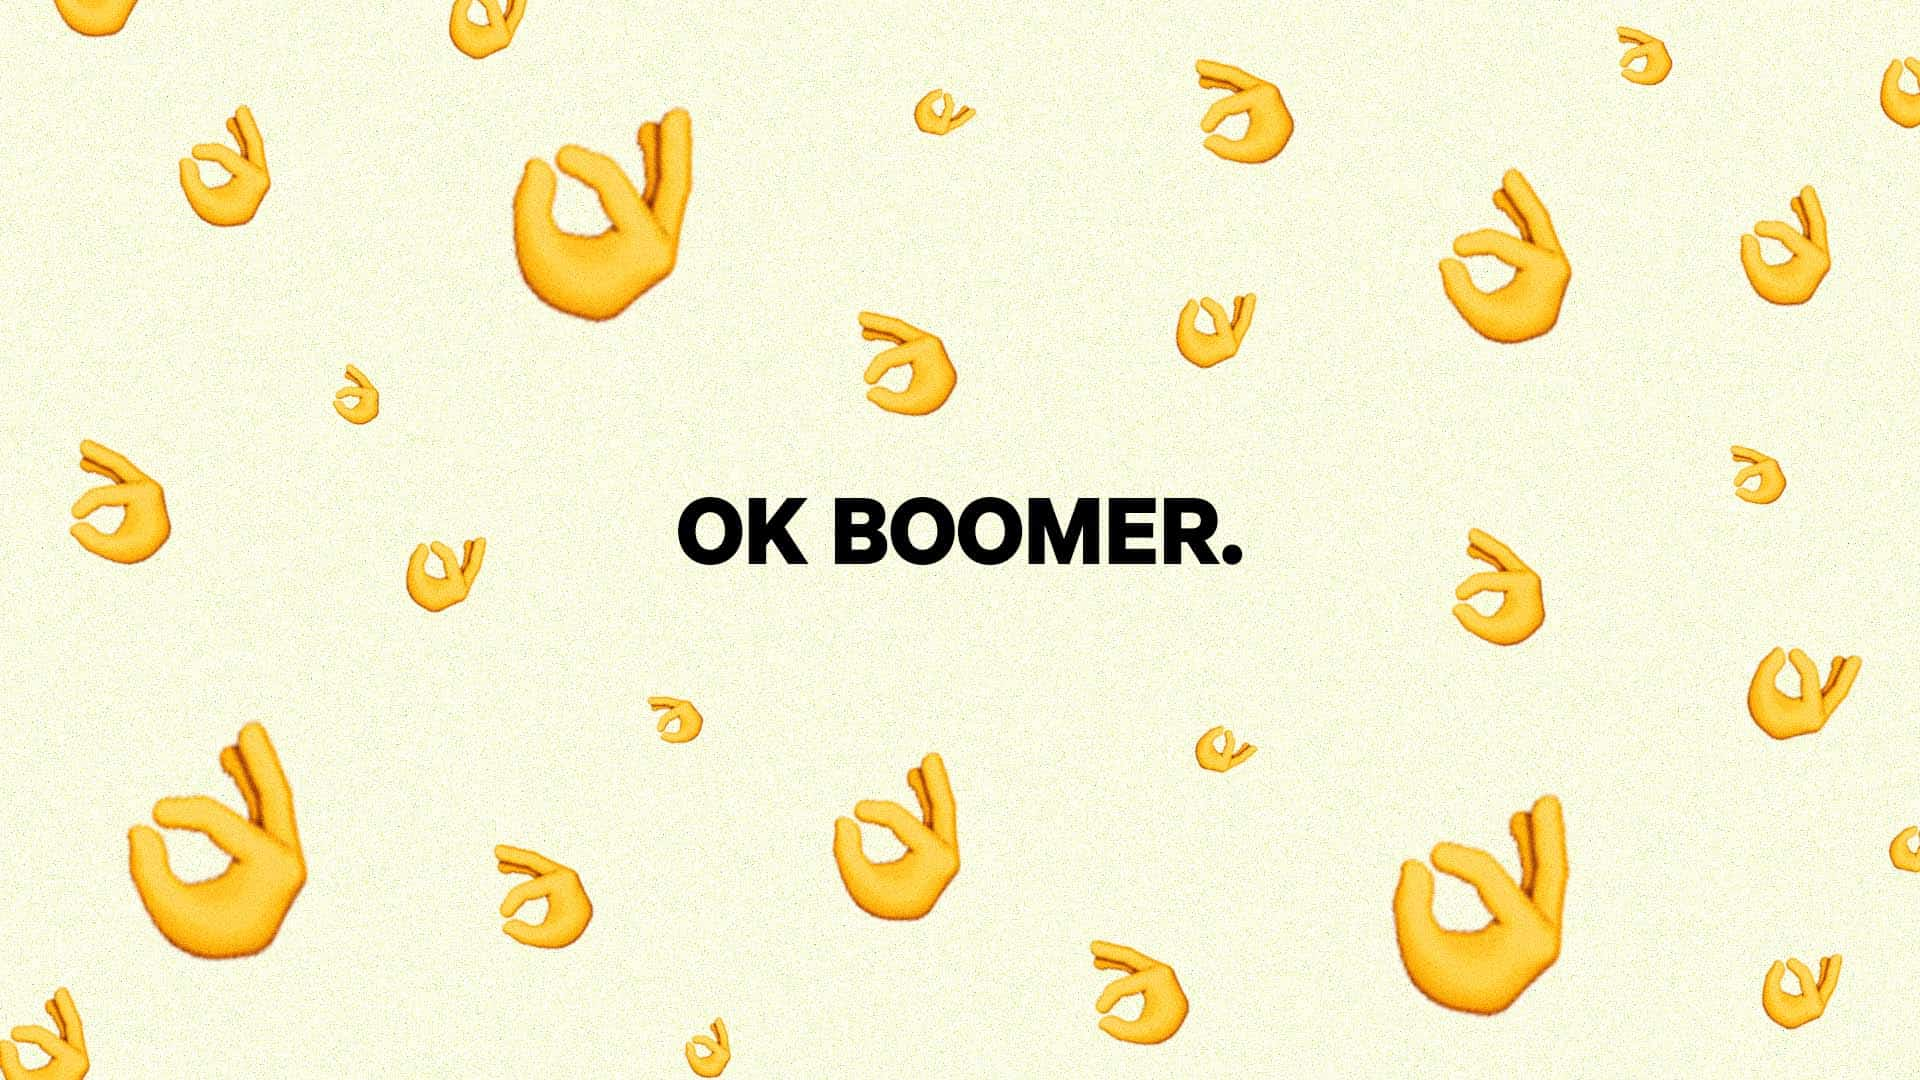 ok boomer io sono giorgia